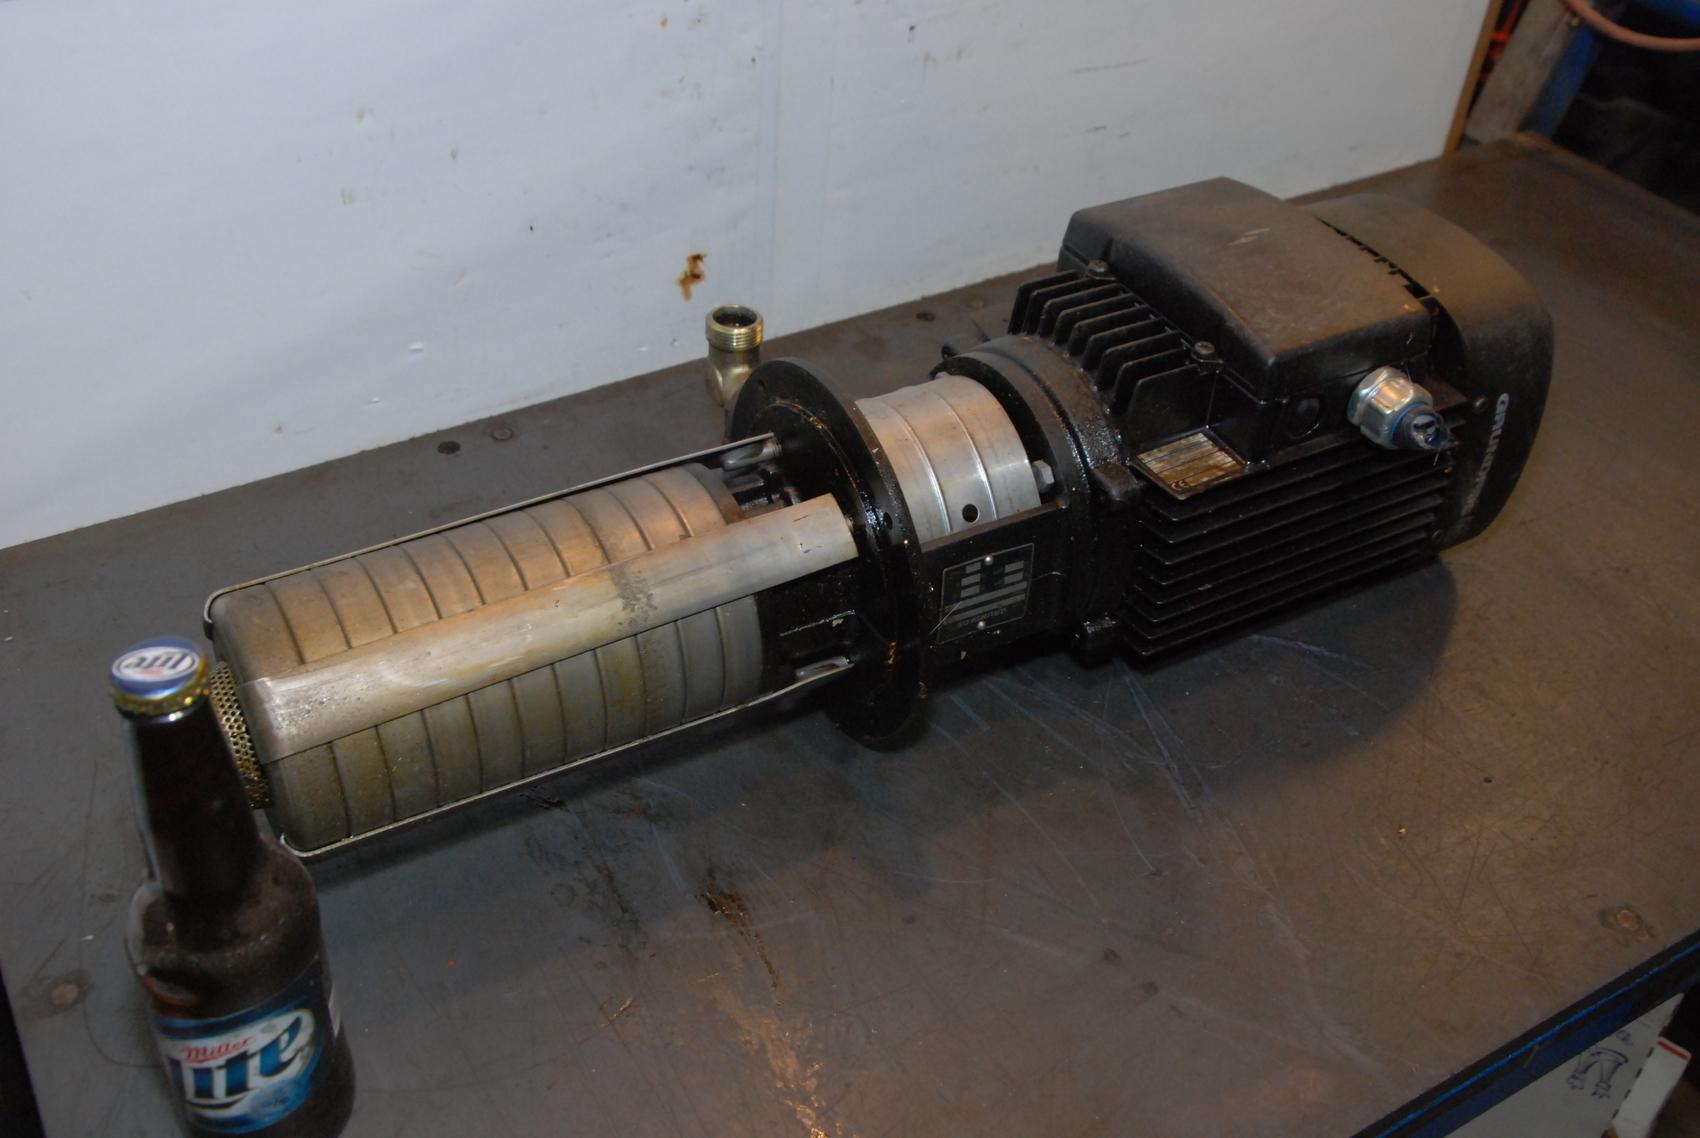 GRUNDFOS MOTOR PUMP MG 100LA2-24FT115-B,CRK2-90 CENTRIFUGAL PUMP